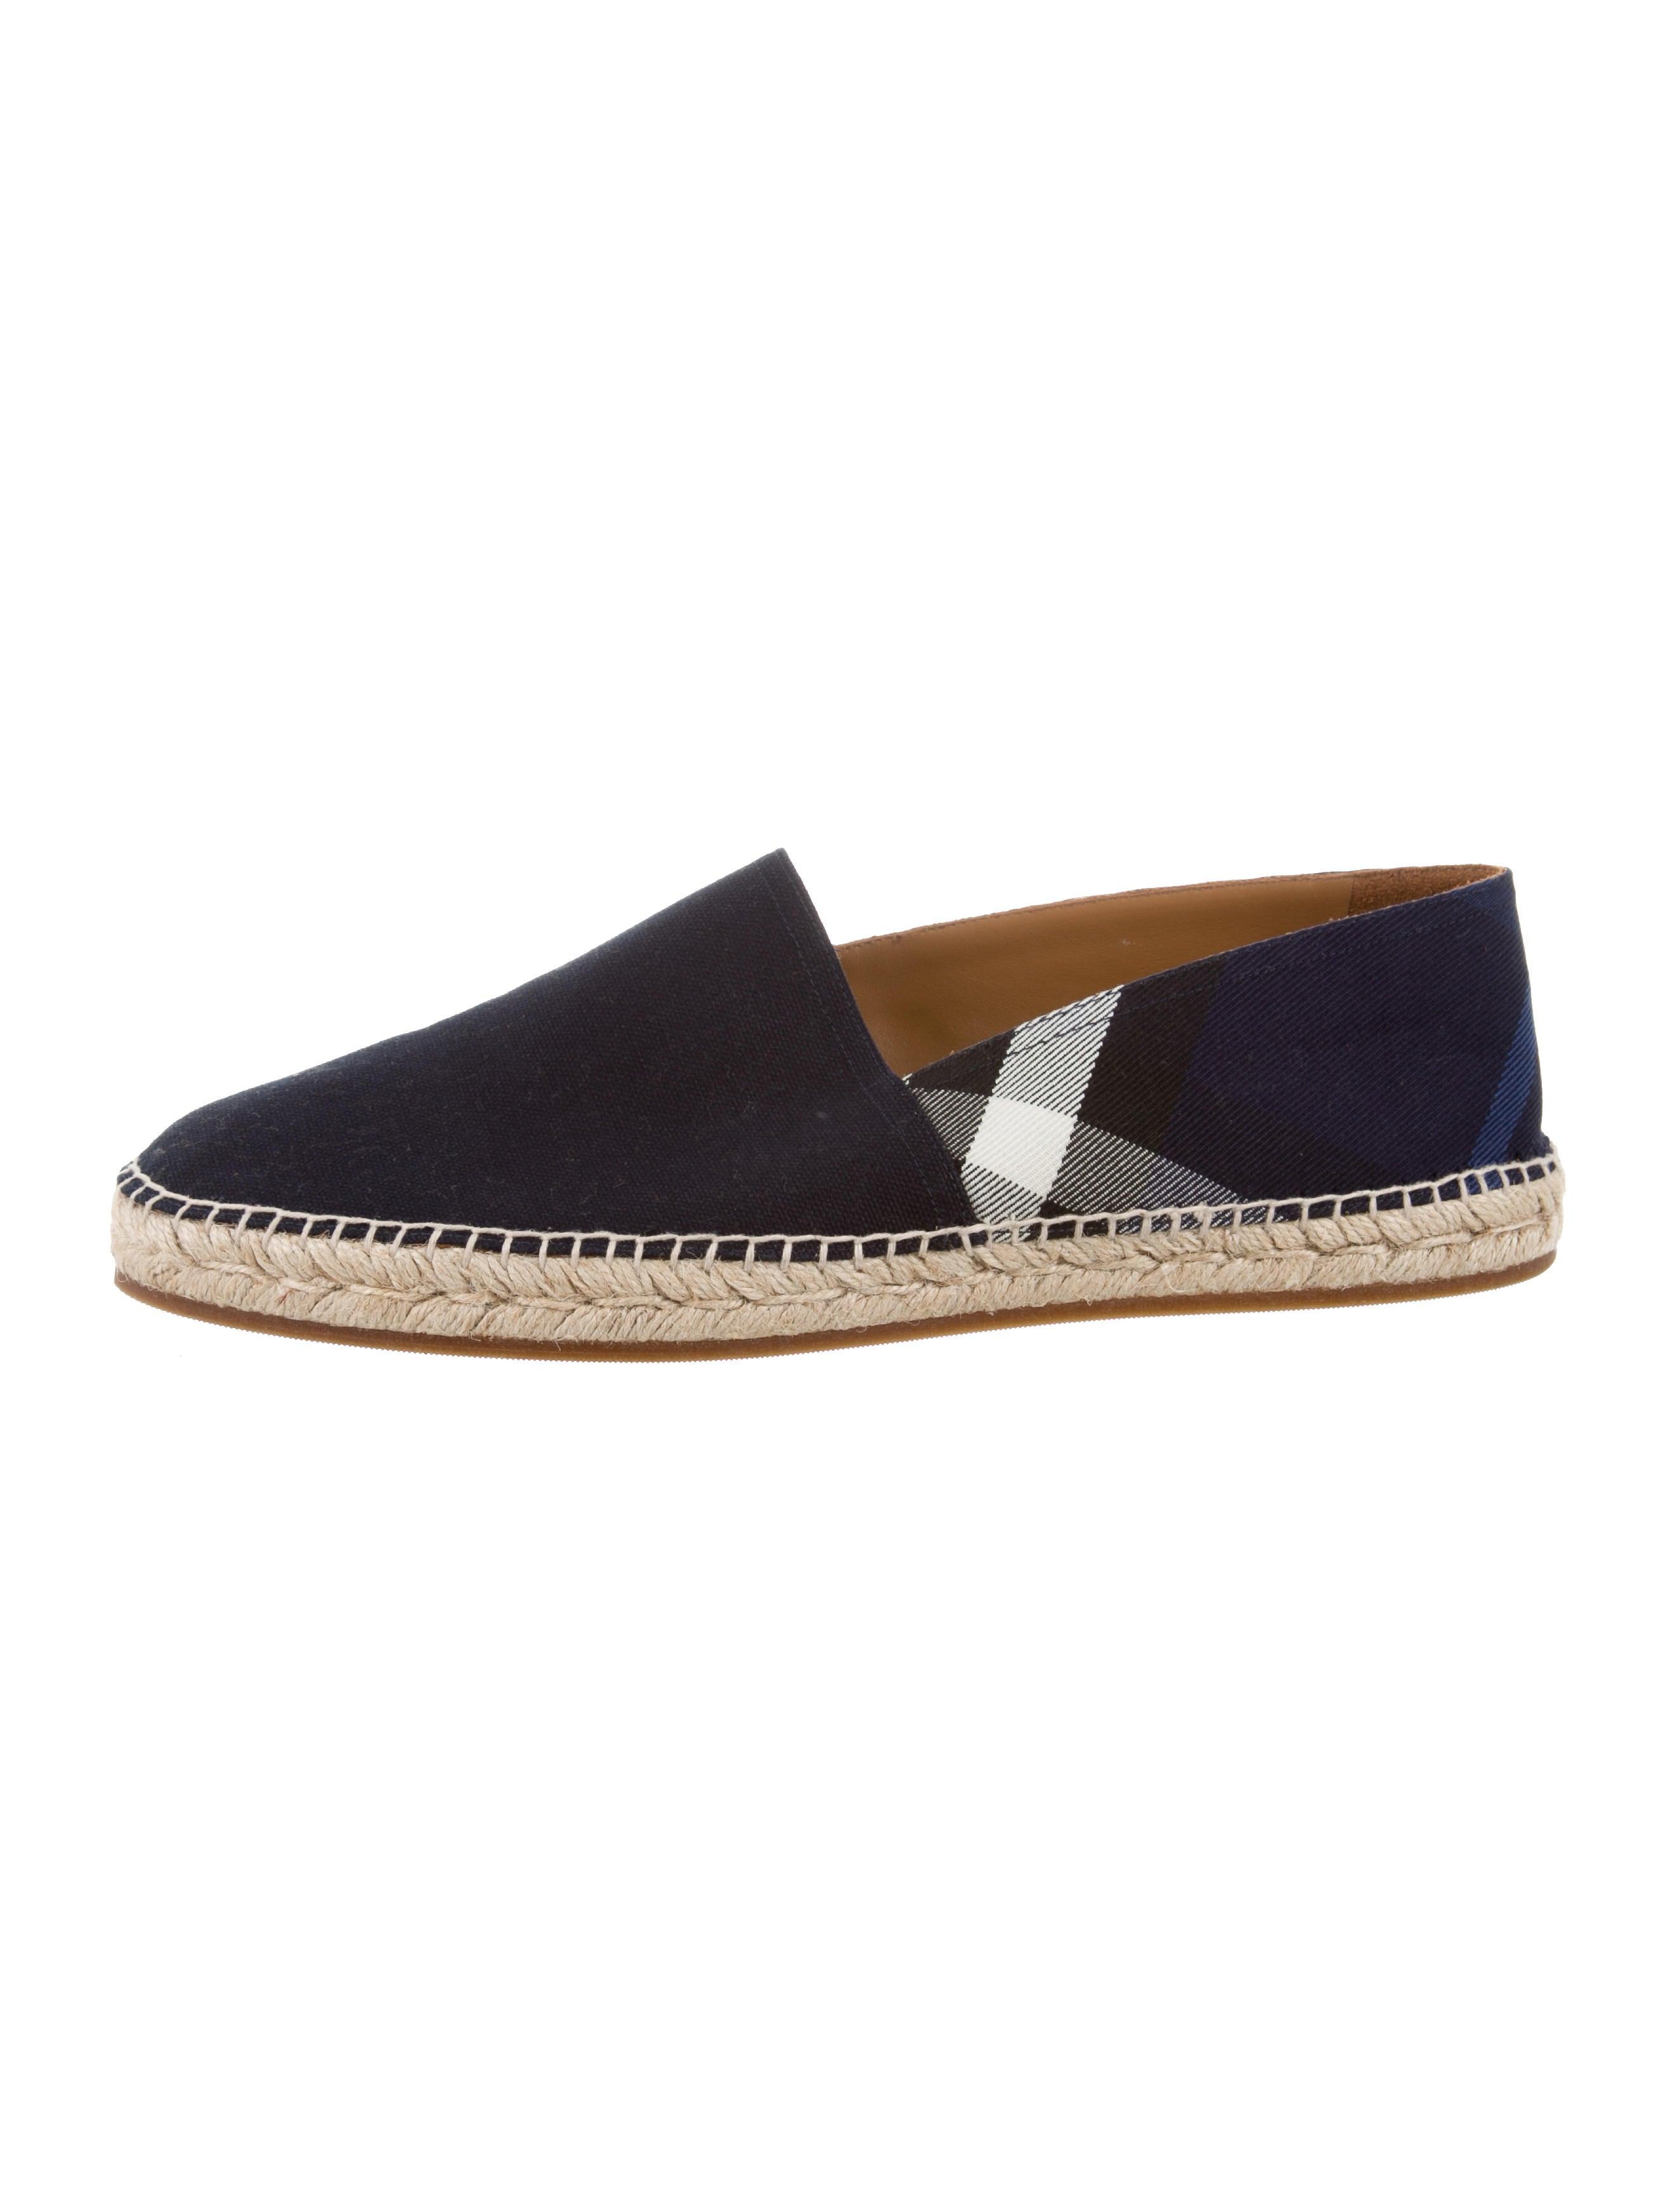 ee1f5acf6 Burberry Nova Check Canvas Espadrilles - Shoes - BUR101530 | The ...